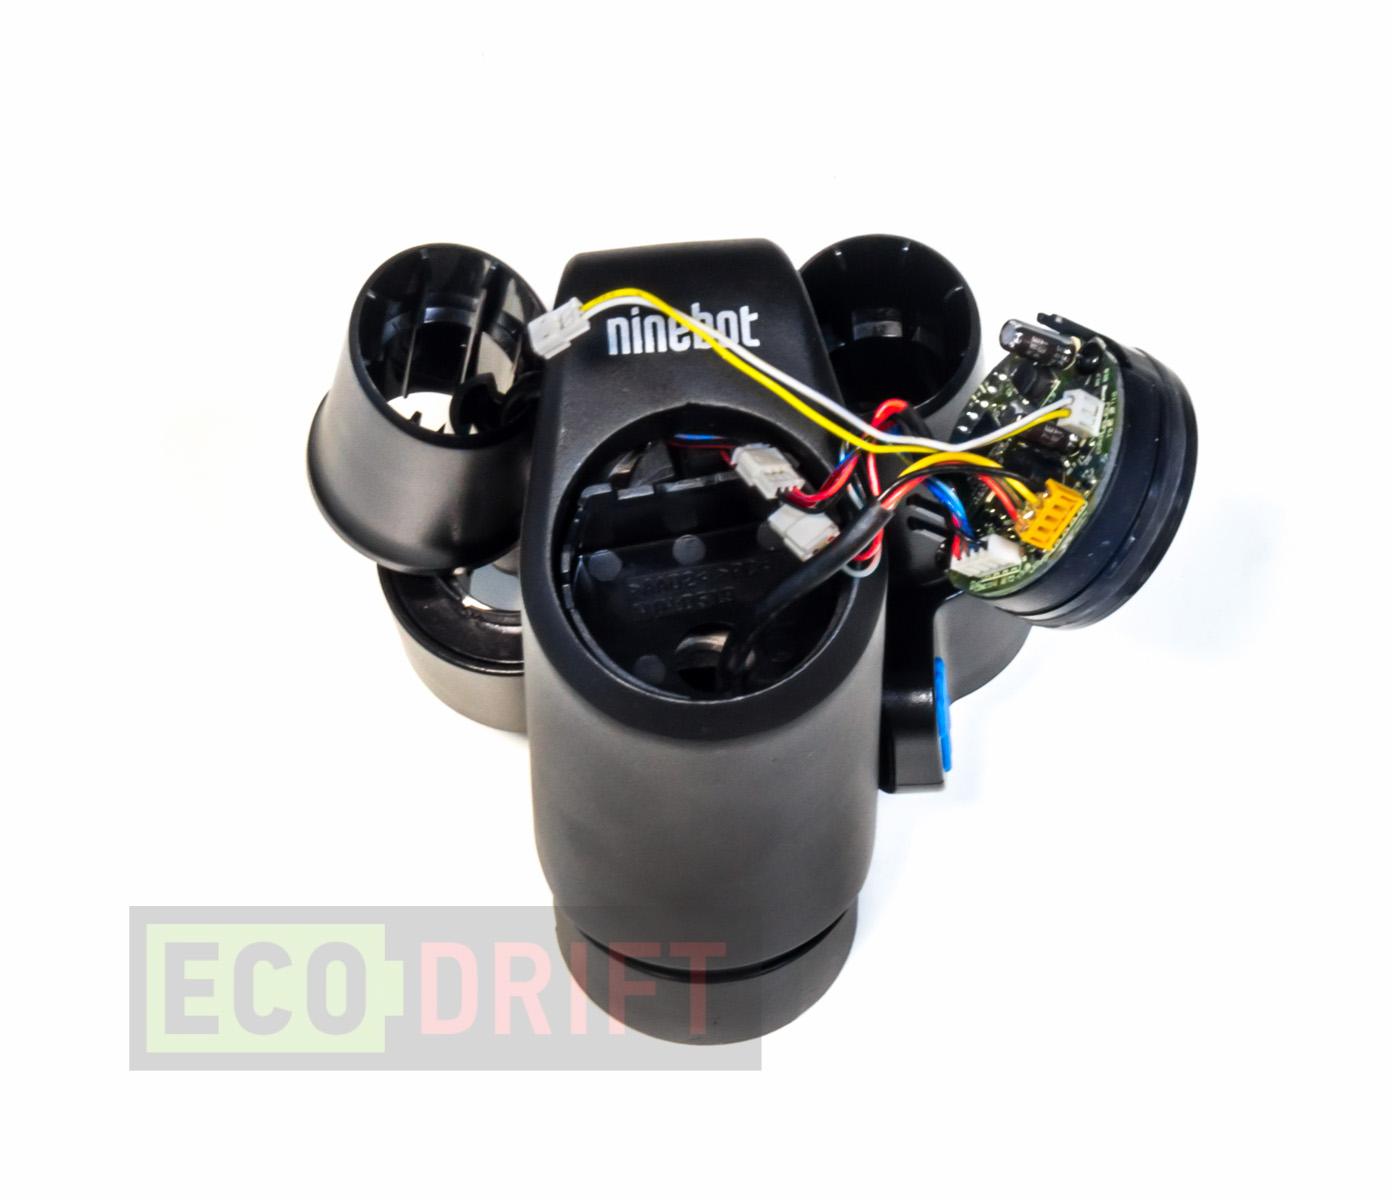 Обзор электросамоката Ninebot by Segway Kickscooter ES1. Как устроено